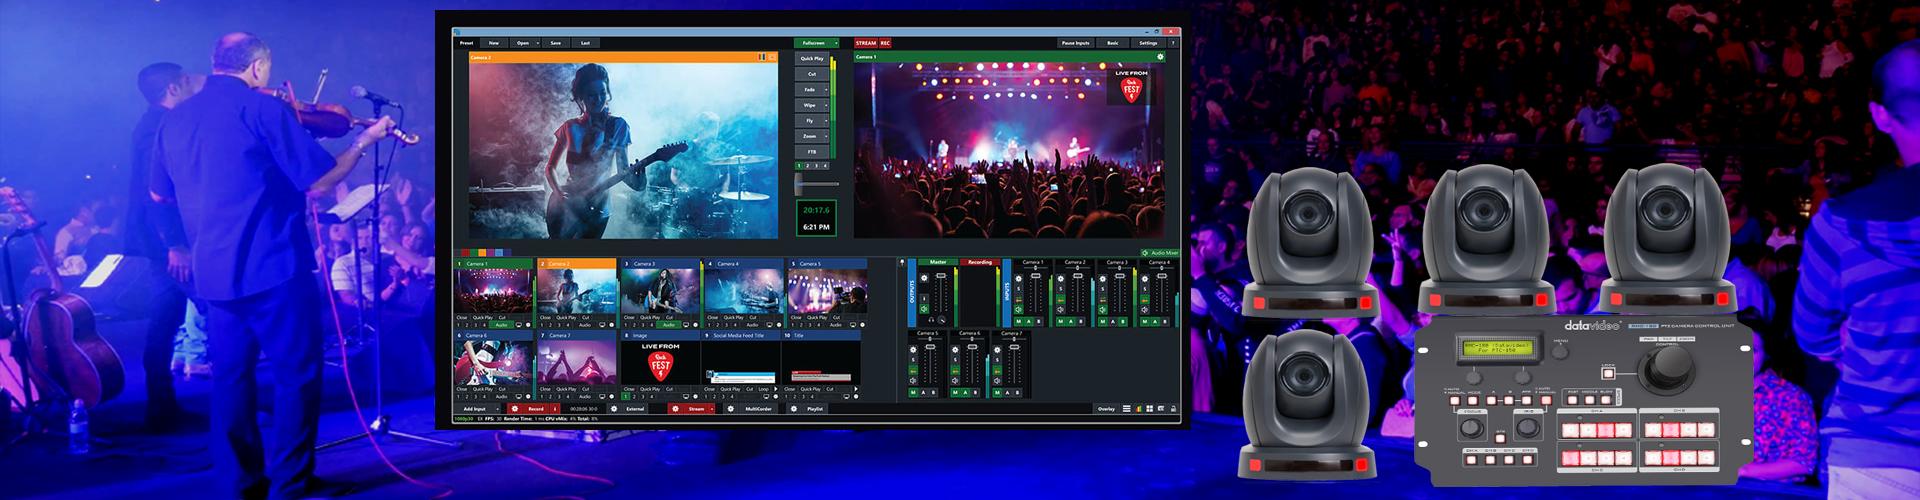 live stream music event los angeles las vegas